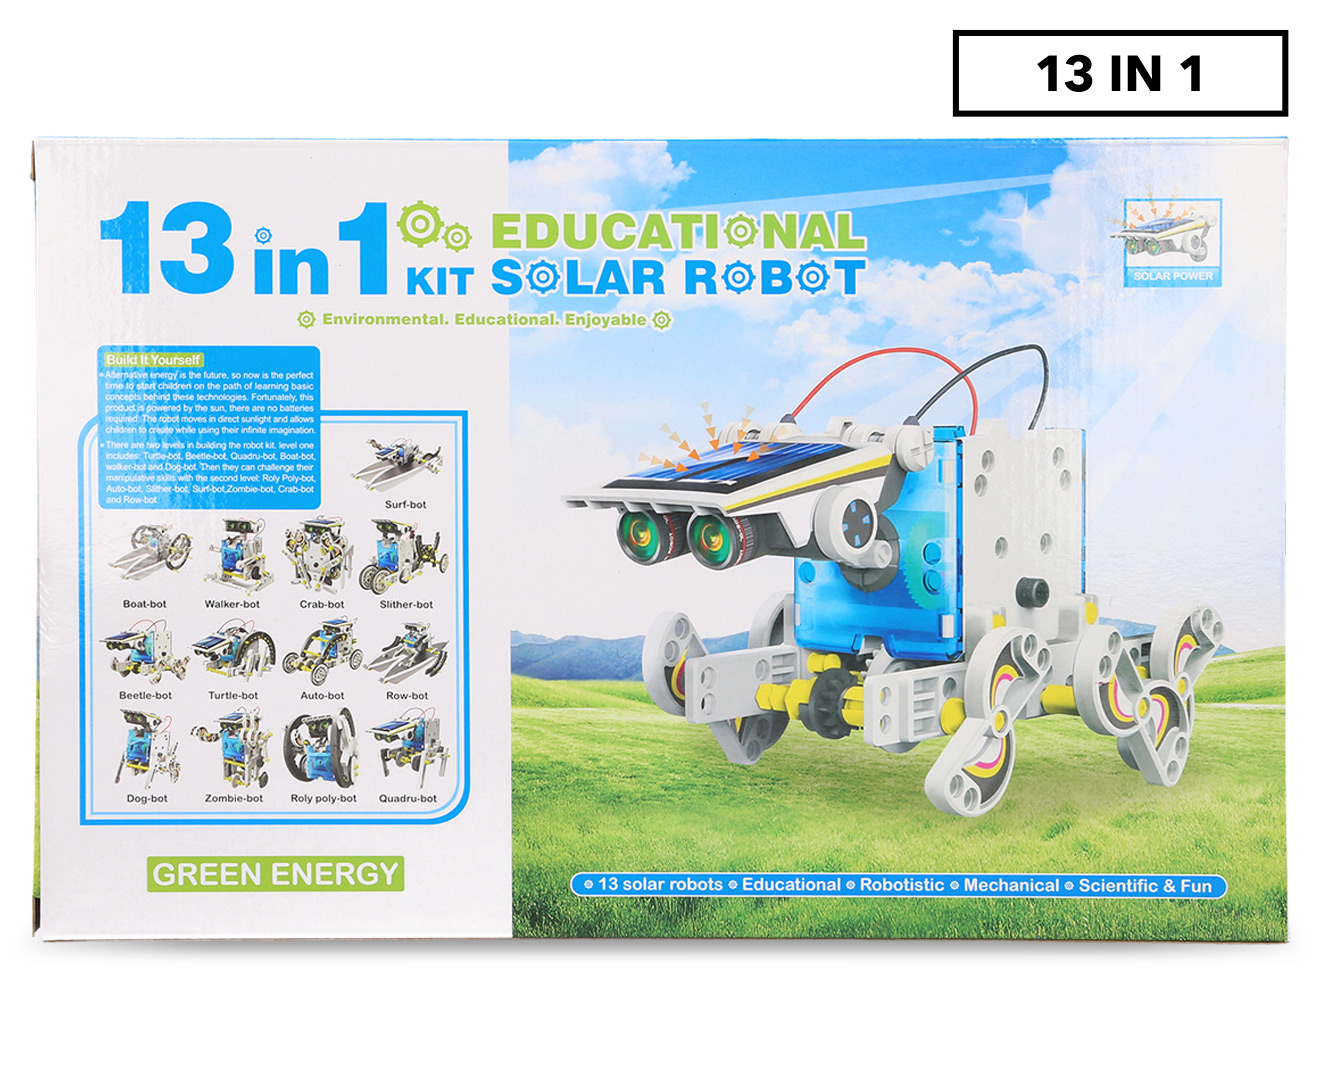 13-in-1 Educational Solar Robot Kit   Scoopon Shopping